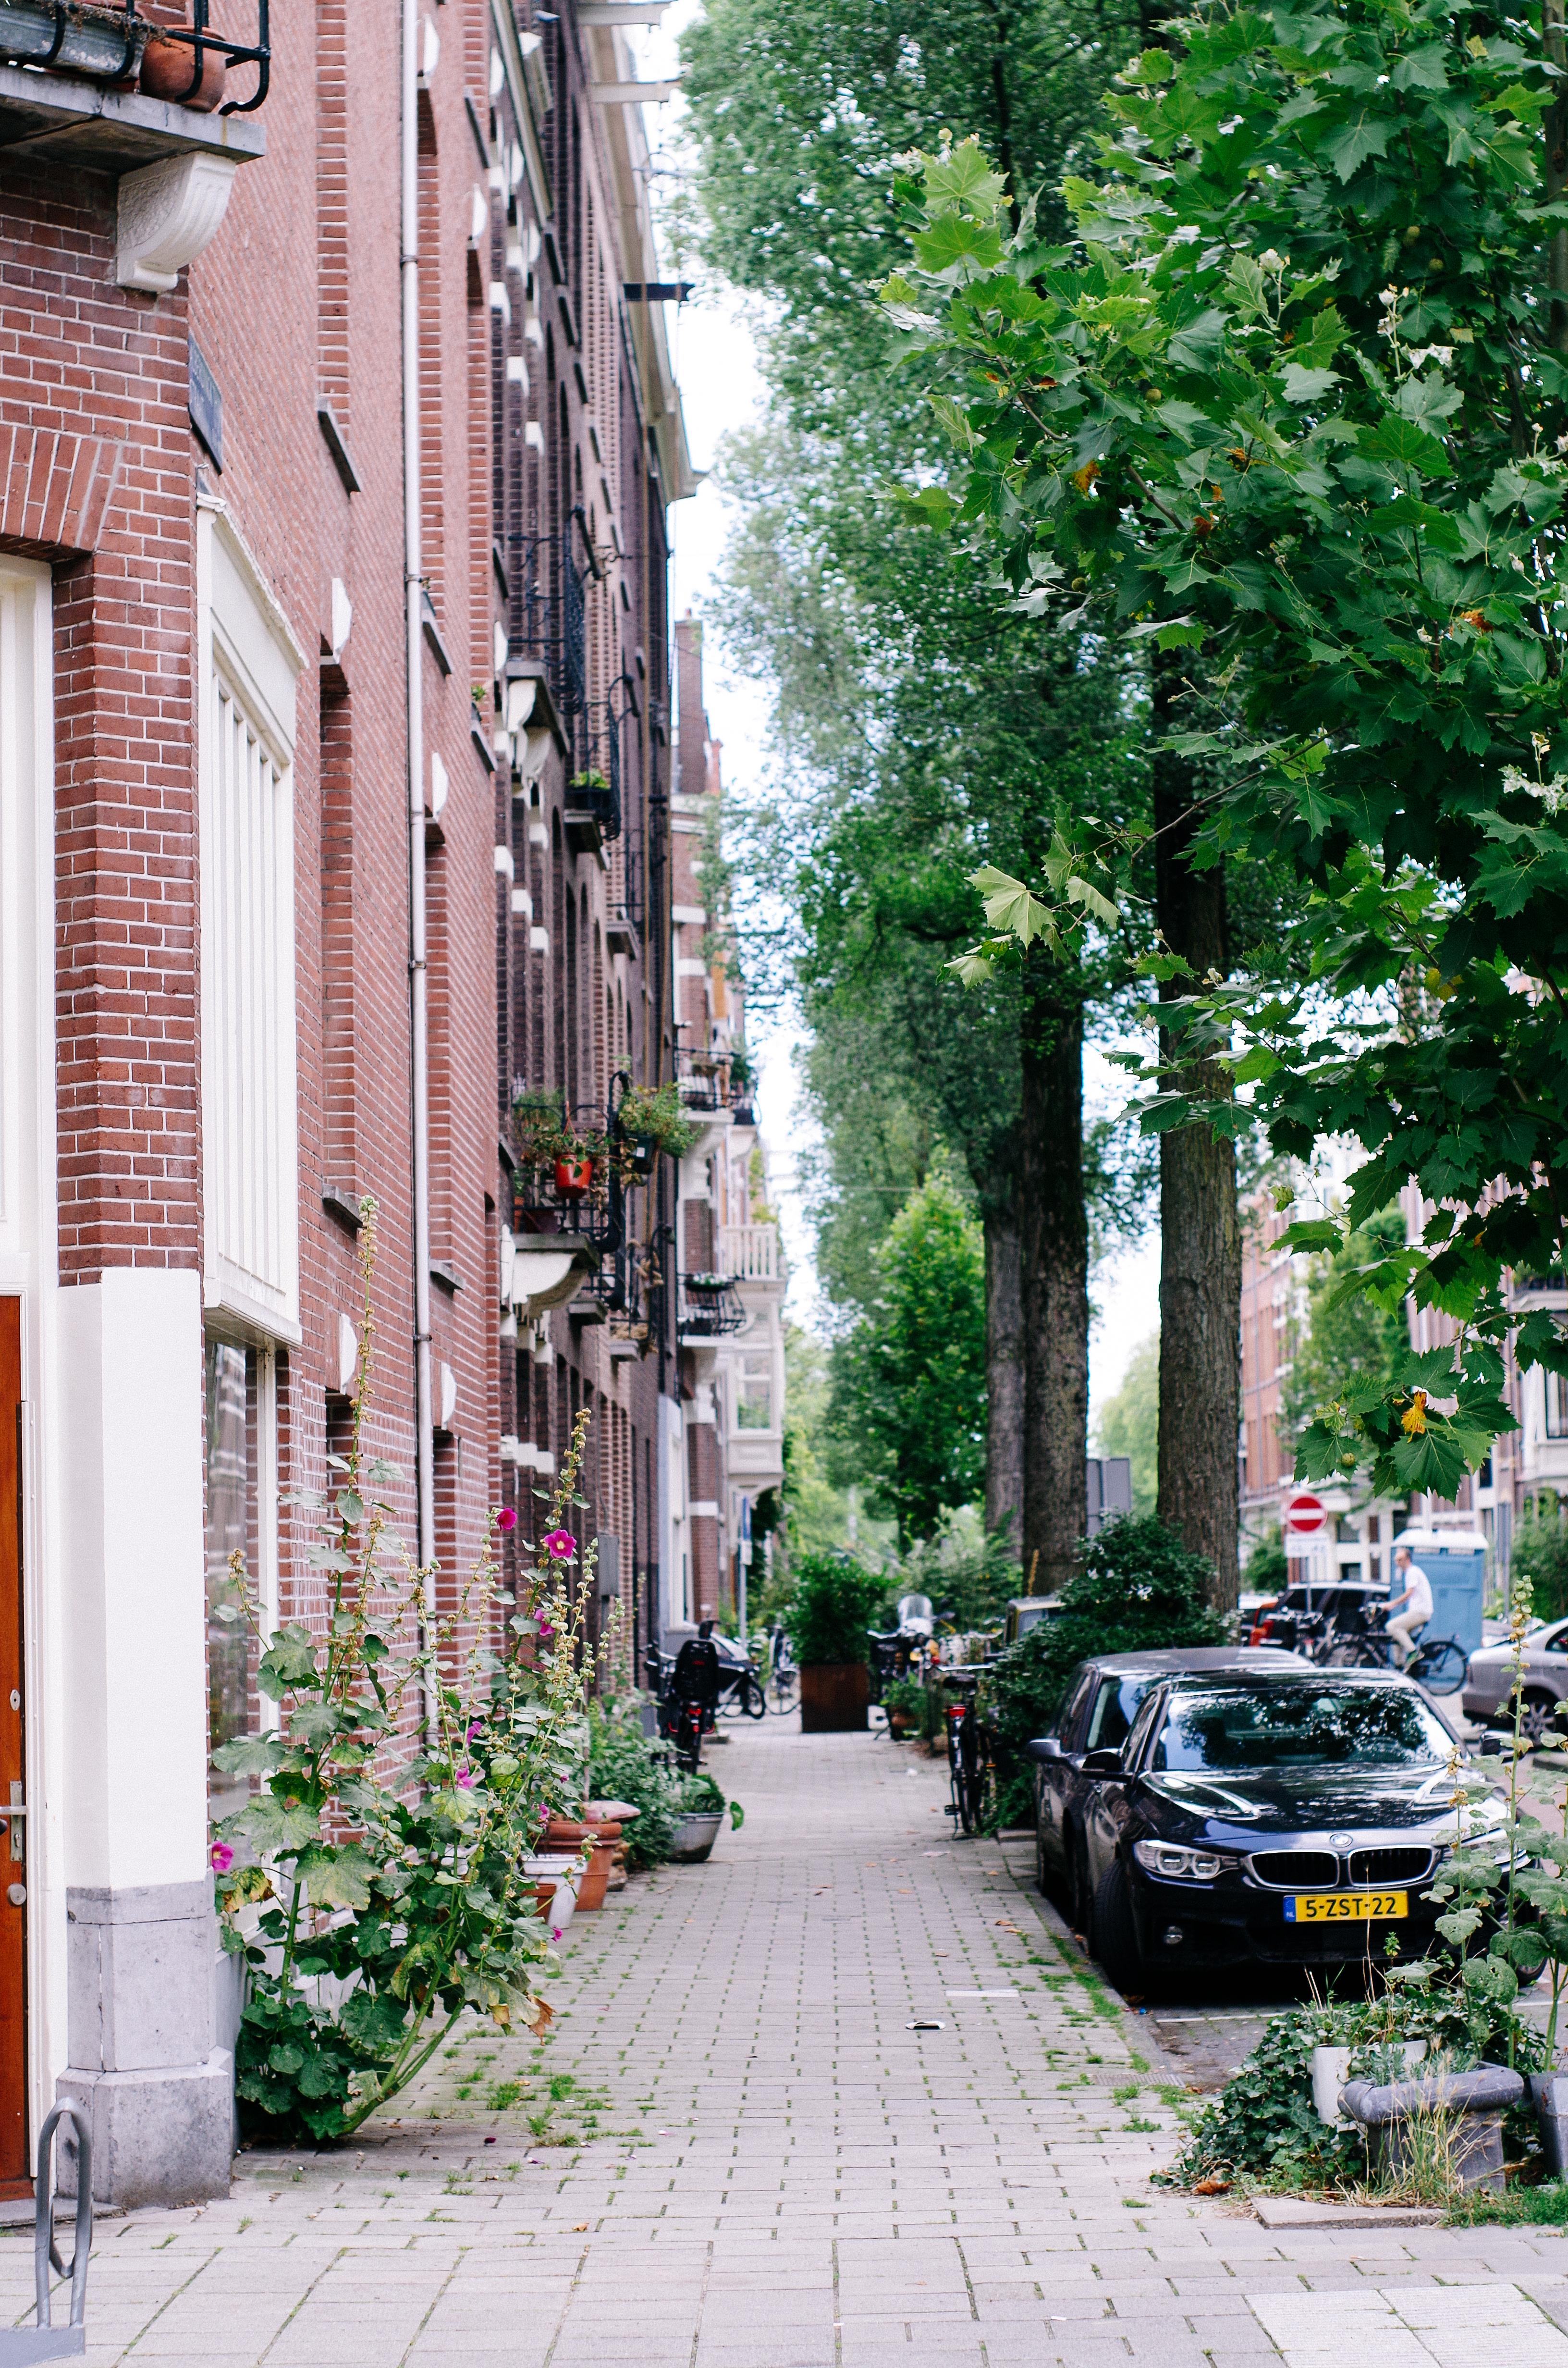 2016 AUG Amsterdam Helmersbuurt -24